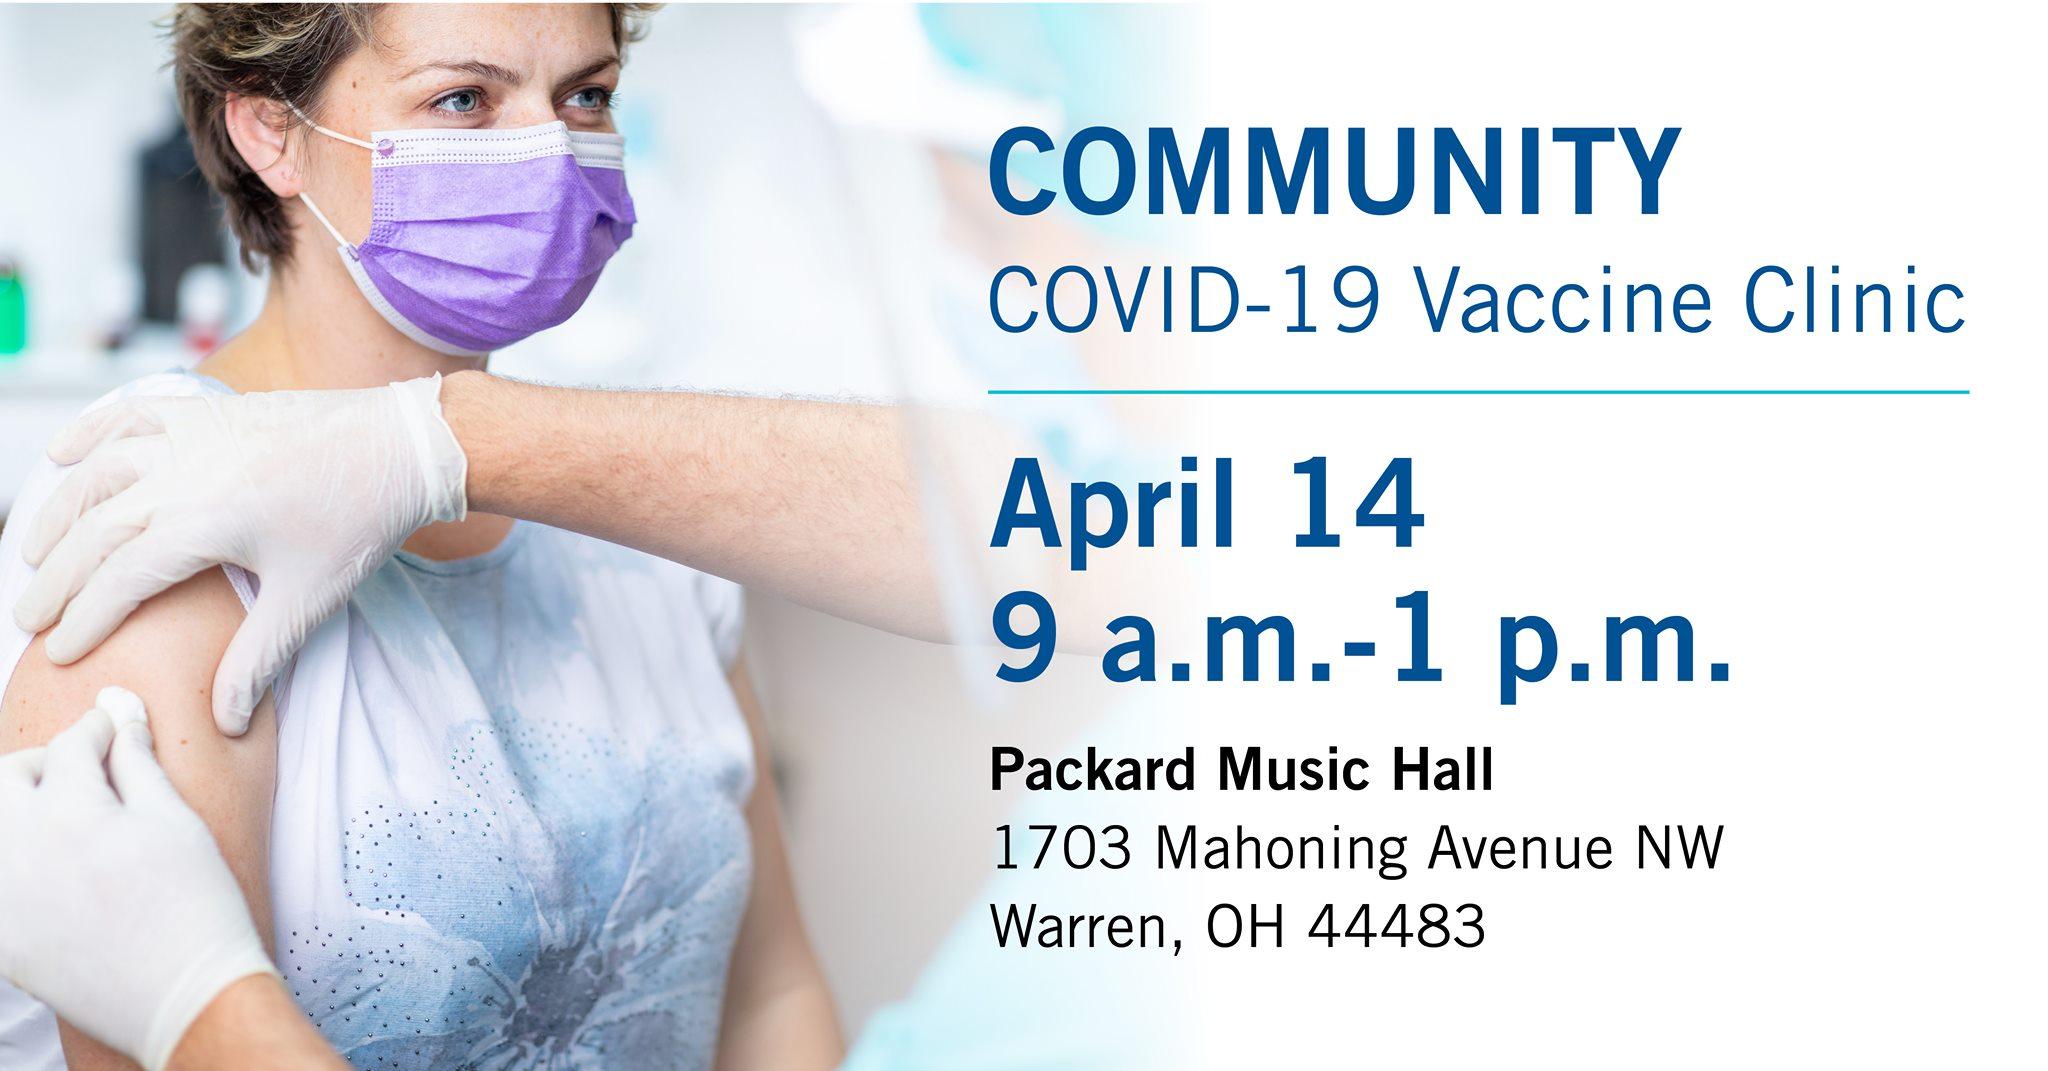 COVID-19 Community Vaccination Clinic